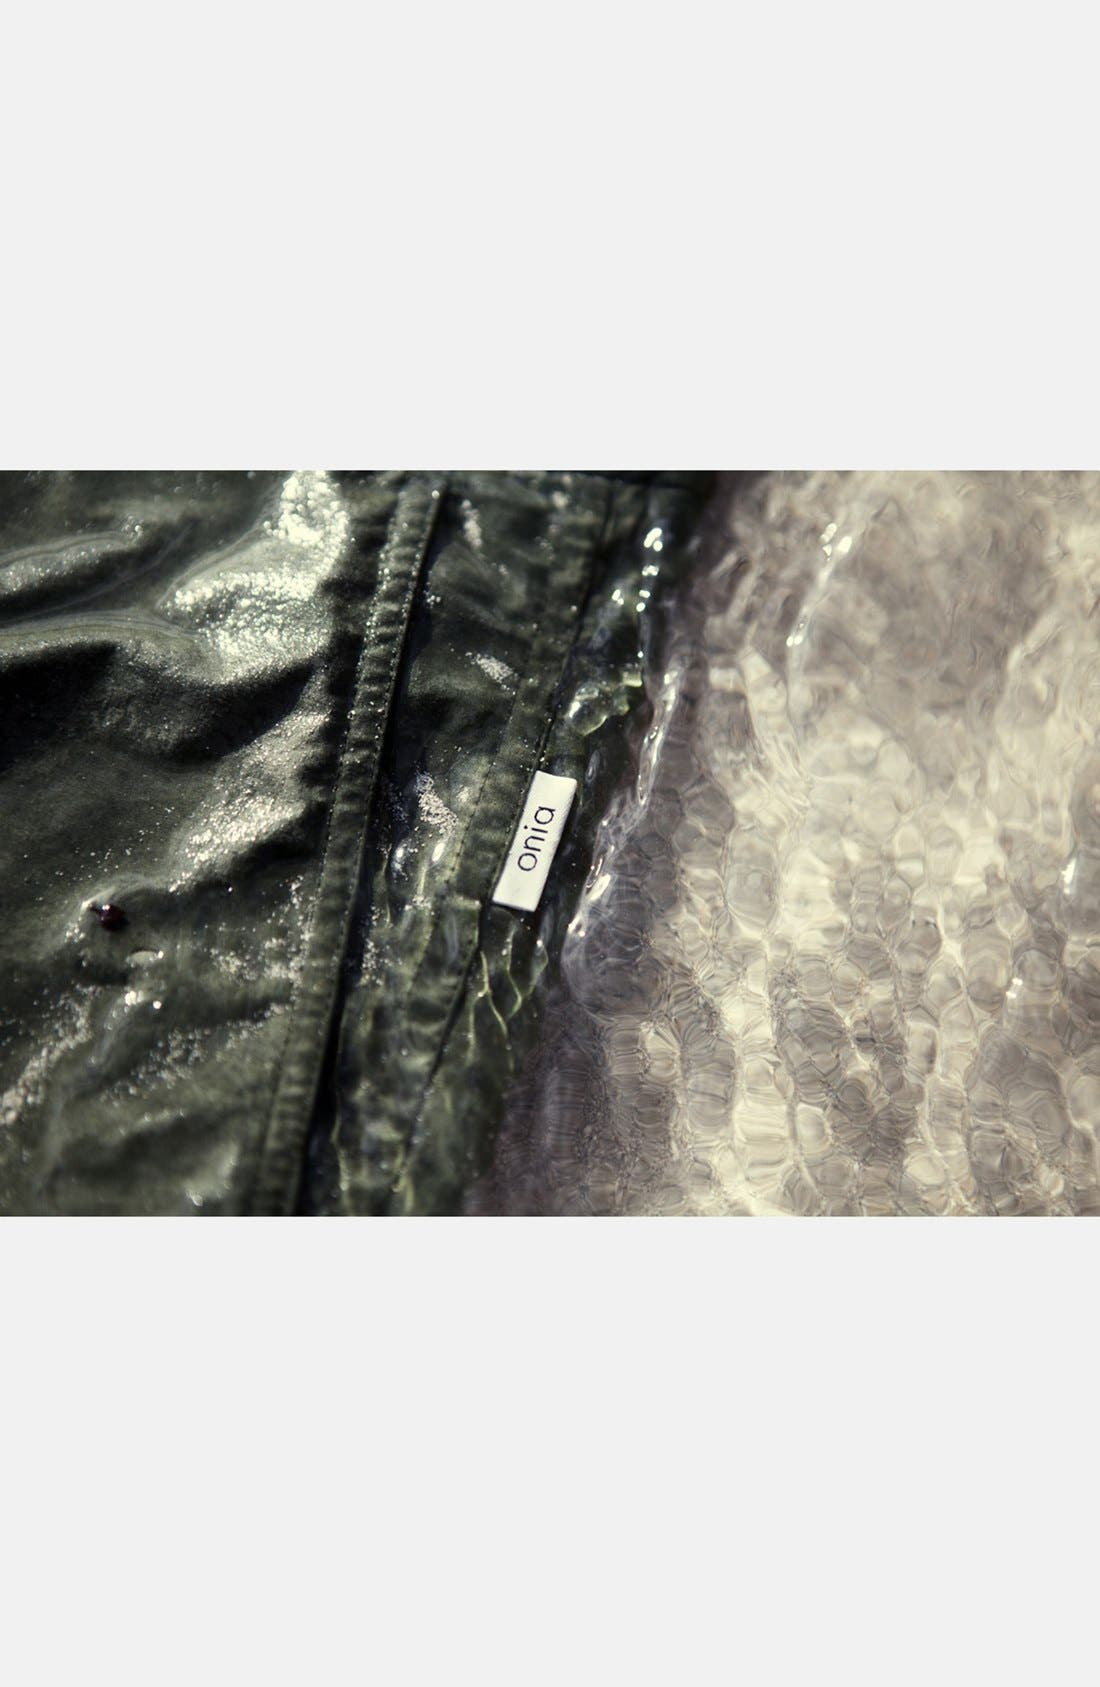 "'Calder 7.5""' Board Shorts,                             Alternate thumbnail 6, color,                             450"